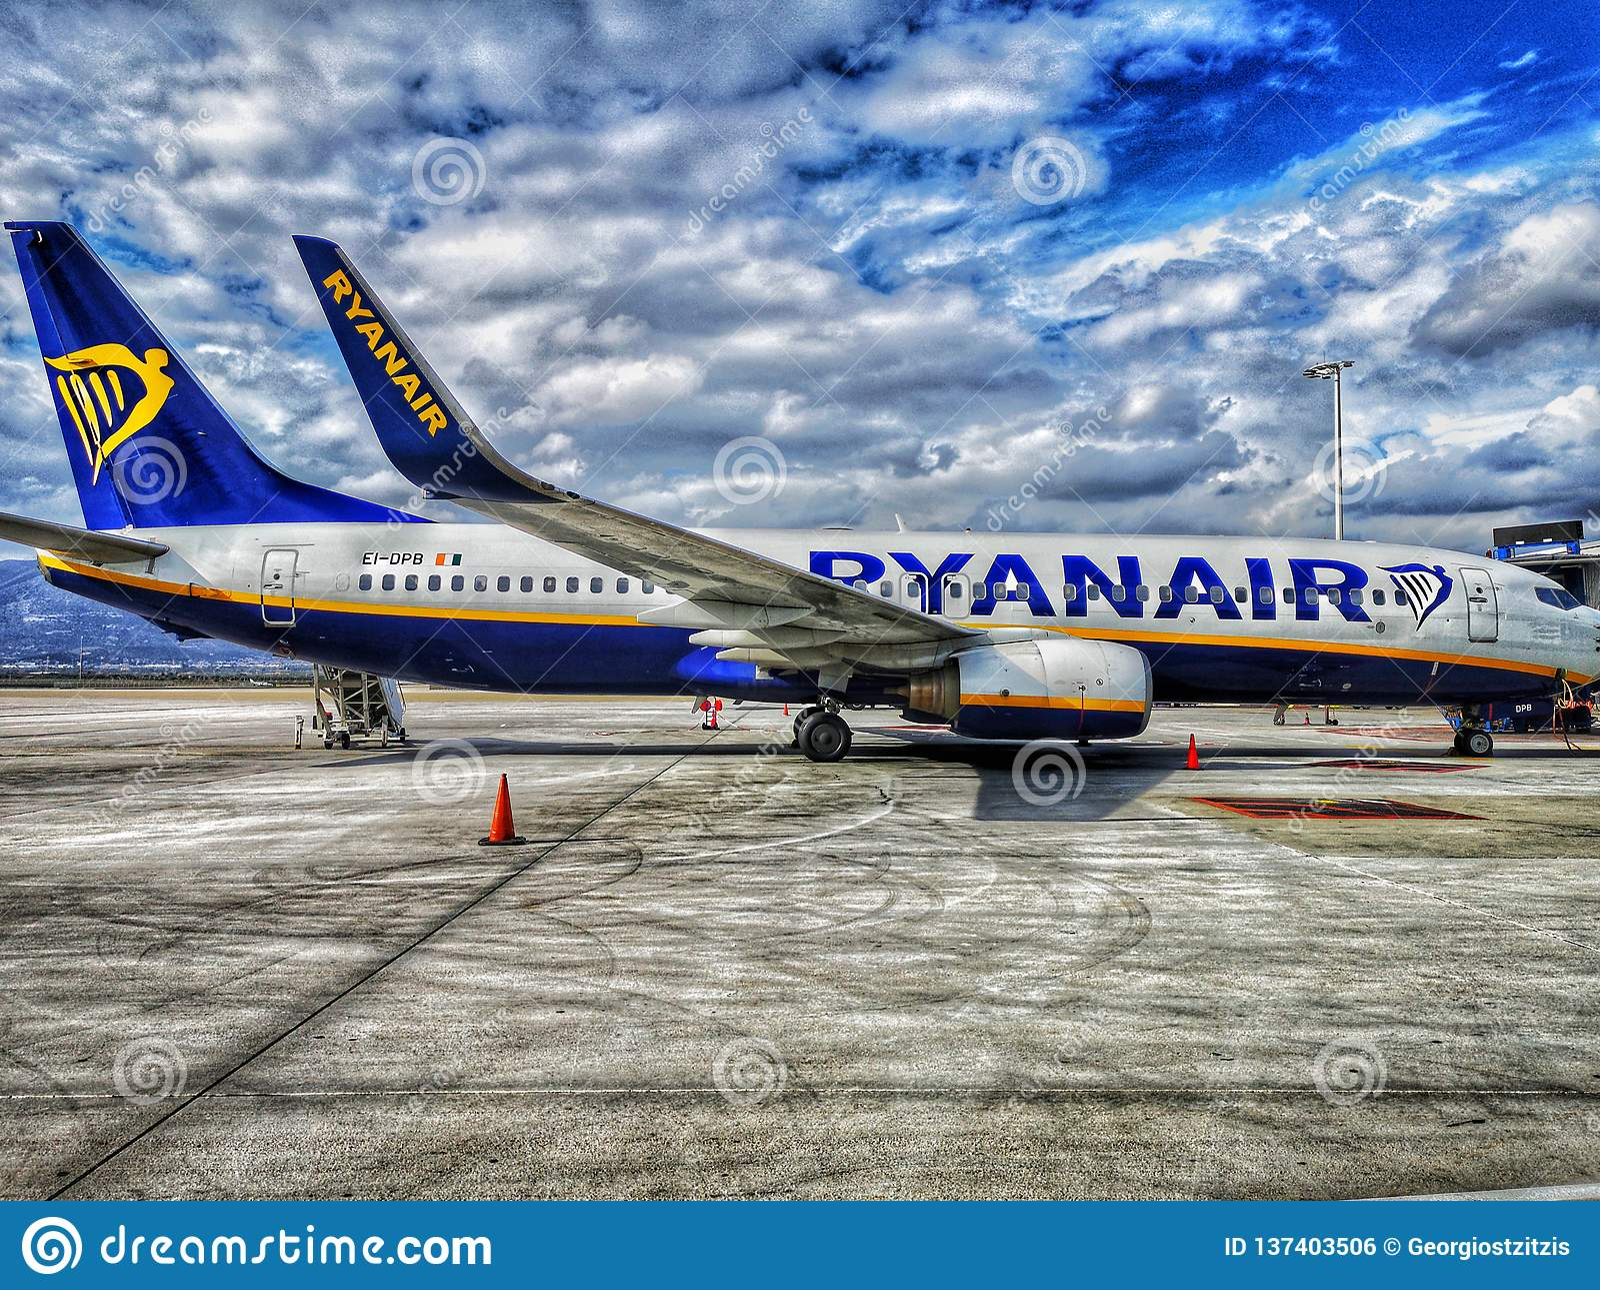 O venizelo dos eleytherios do aeroporto de Atenas, plano de ryanair, é estacionado